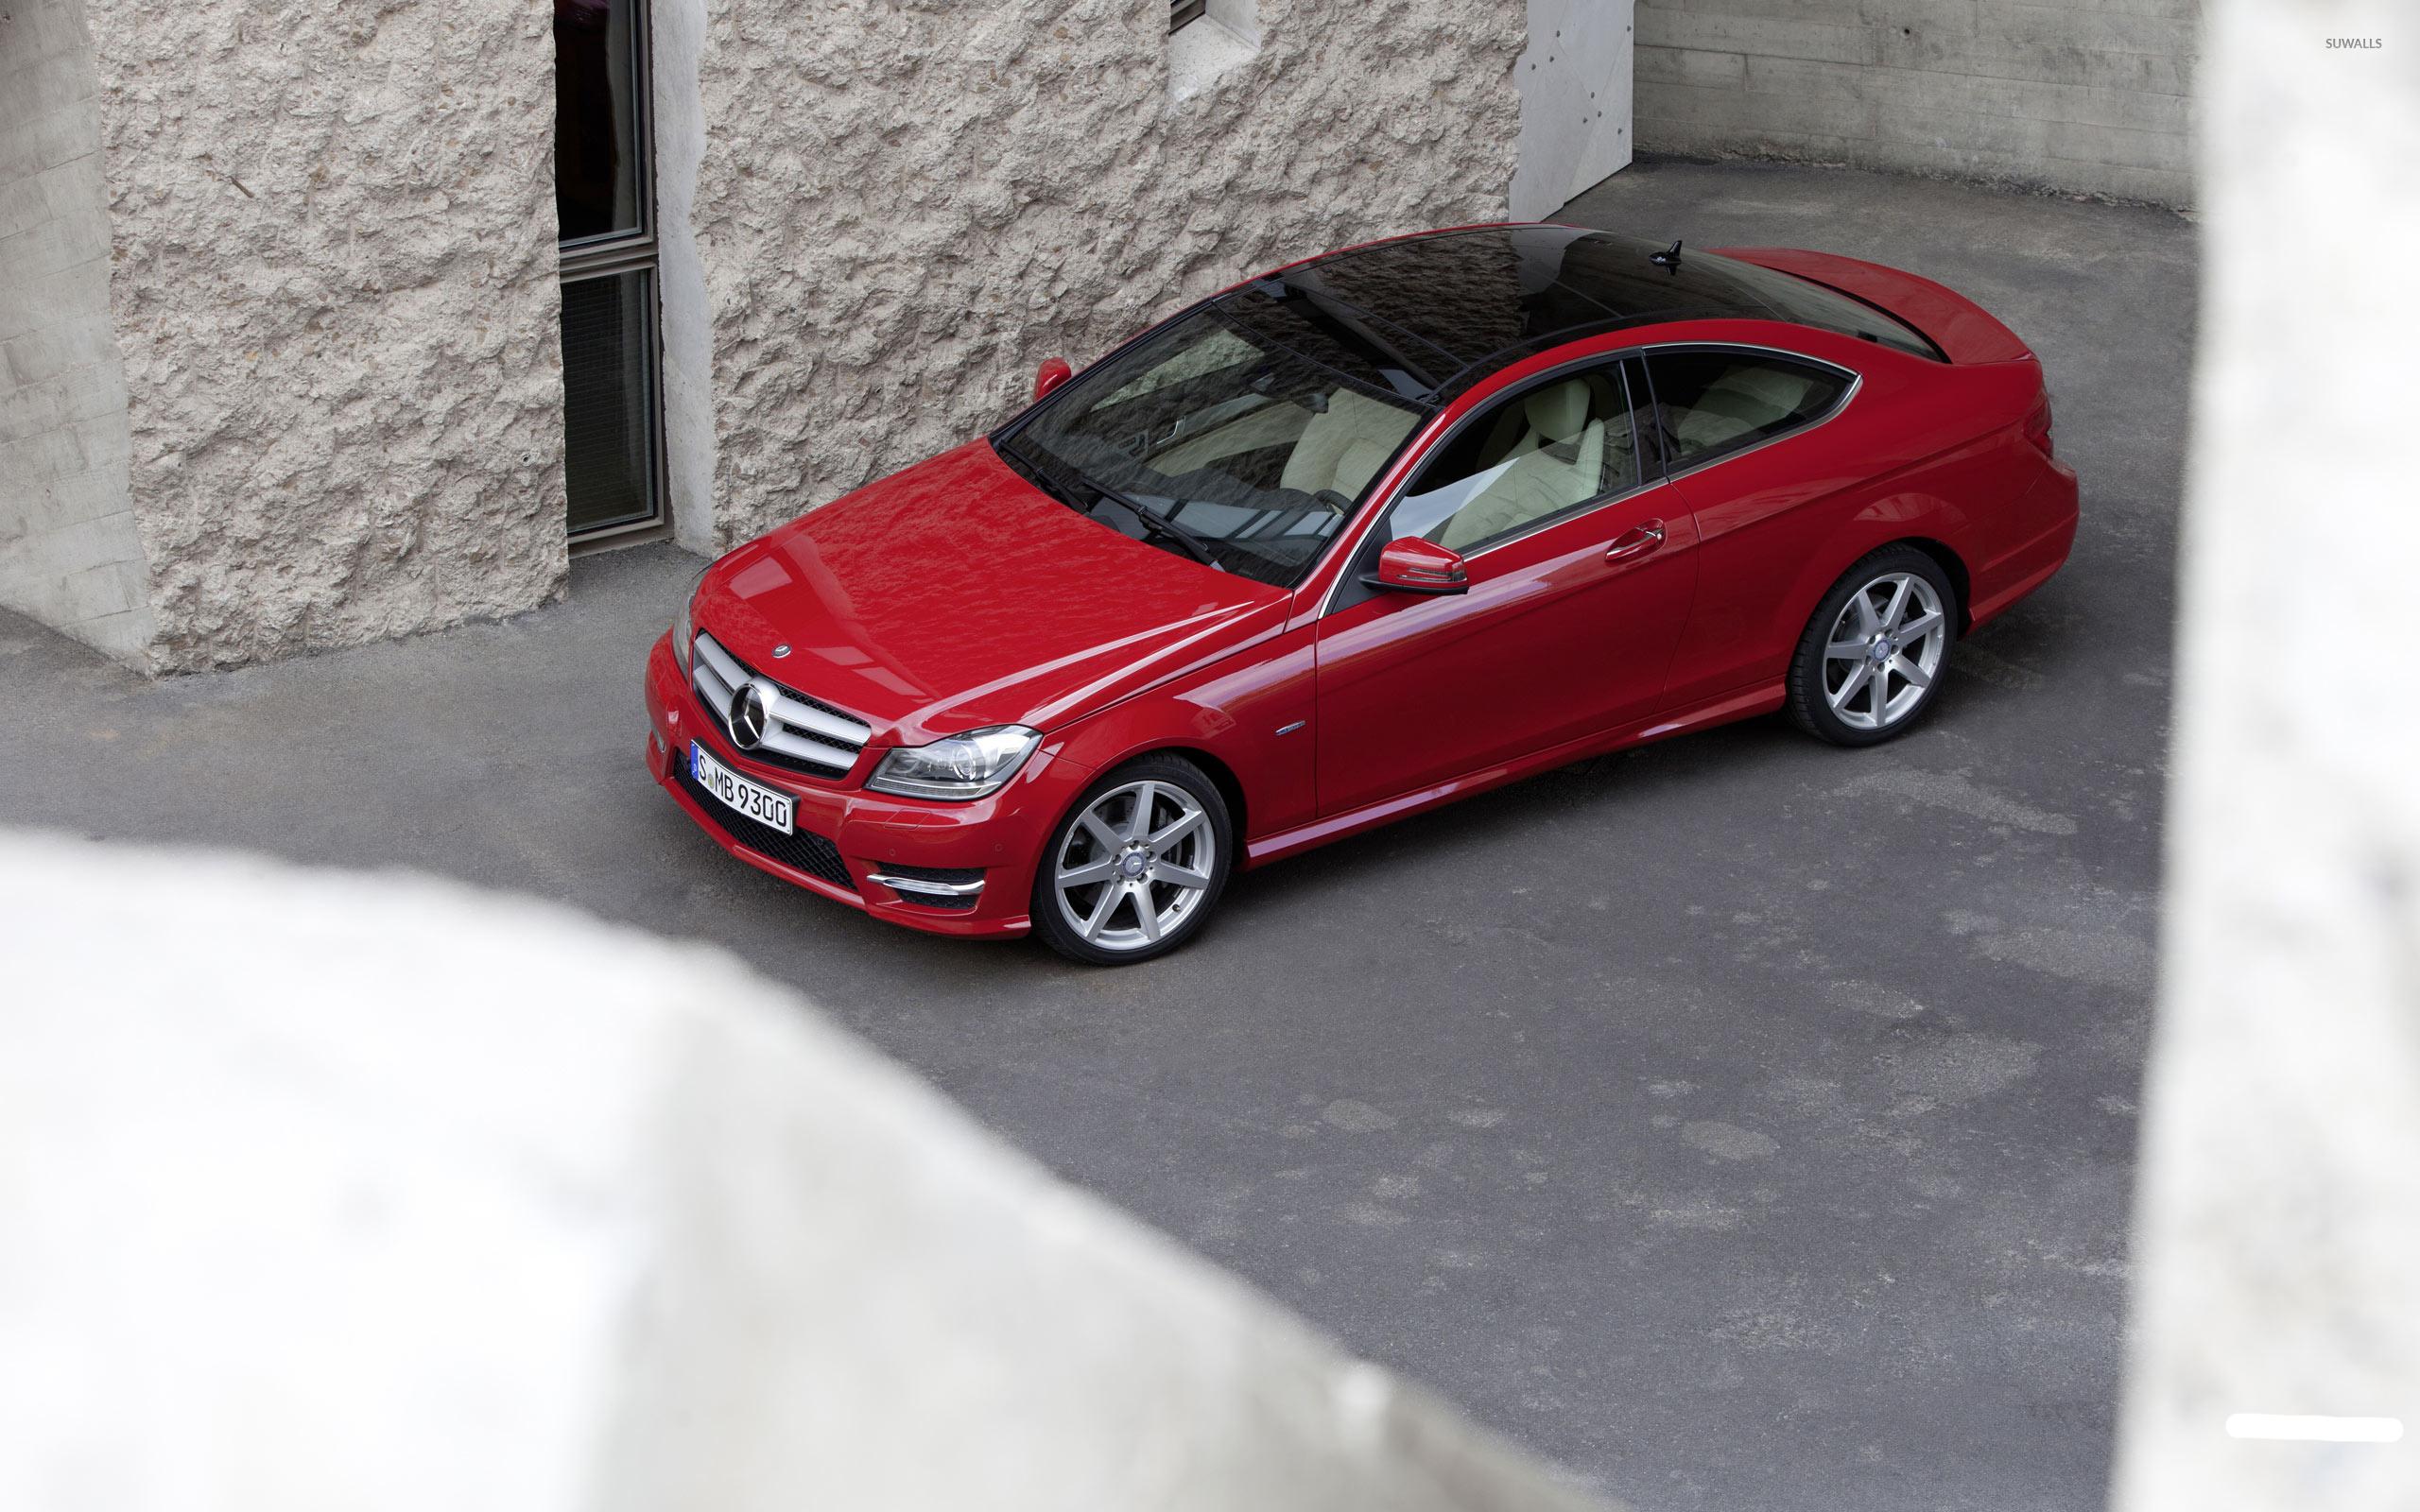 Red 2011 Mercedes-Benz C 250 wallpaper - Car wallpapers ...